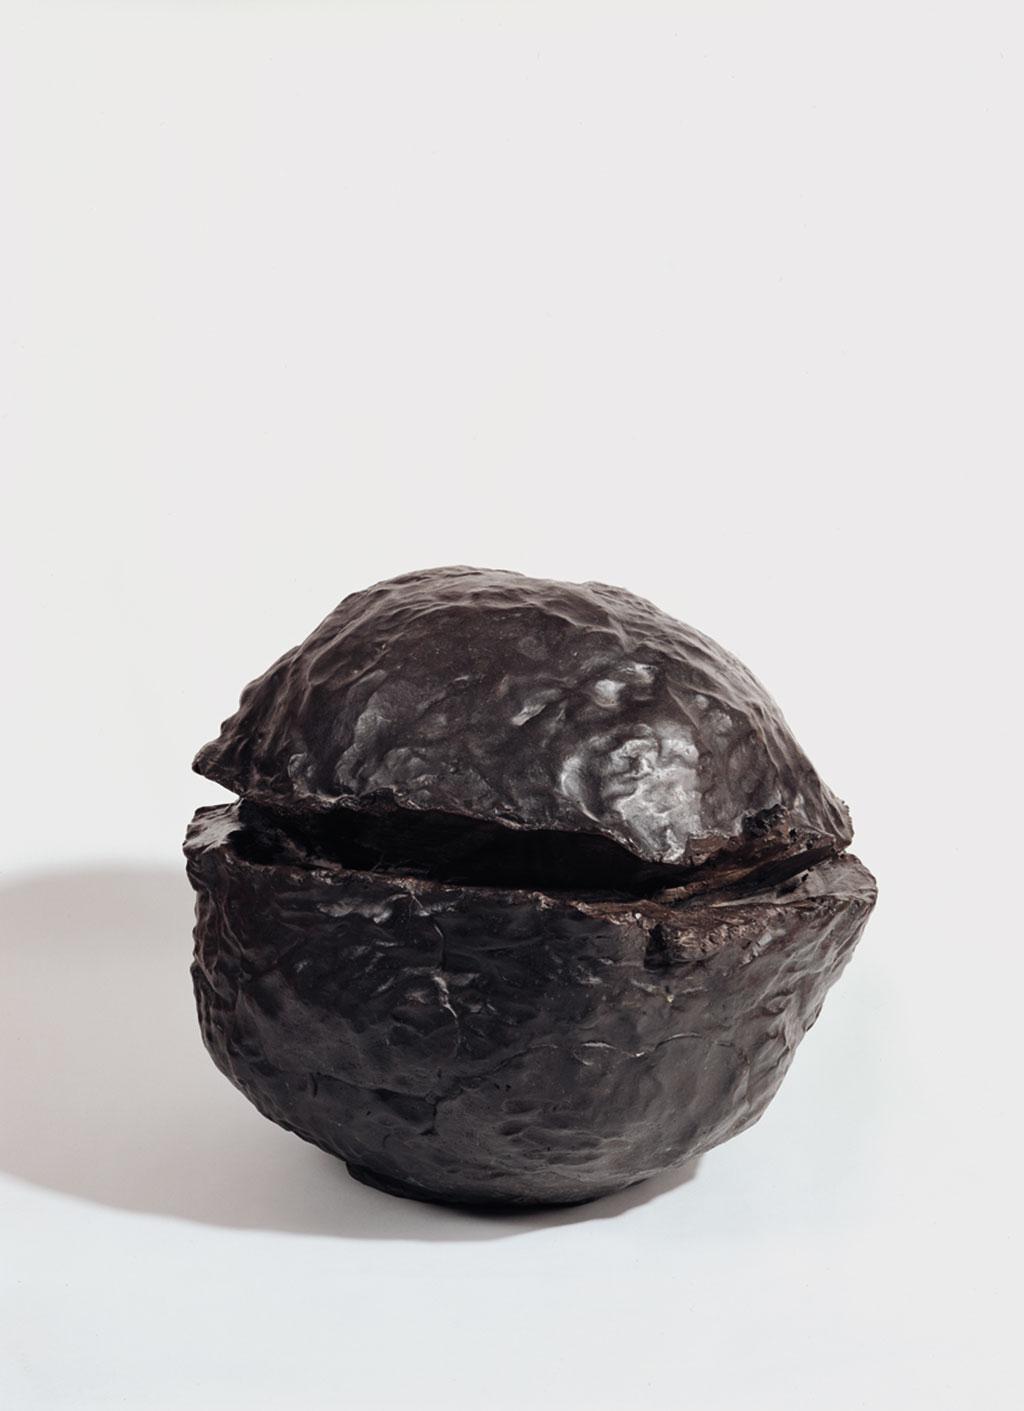 Lucio Fontana (1899 – 1968) Uzamsal Kavram, Doğa,1959-60 Bronz, 66 cm Rira Koleksiyonu